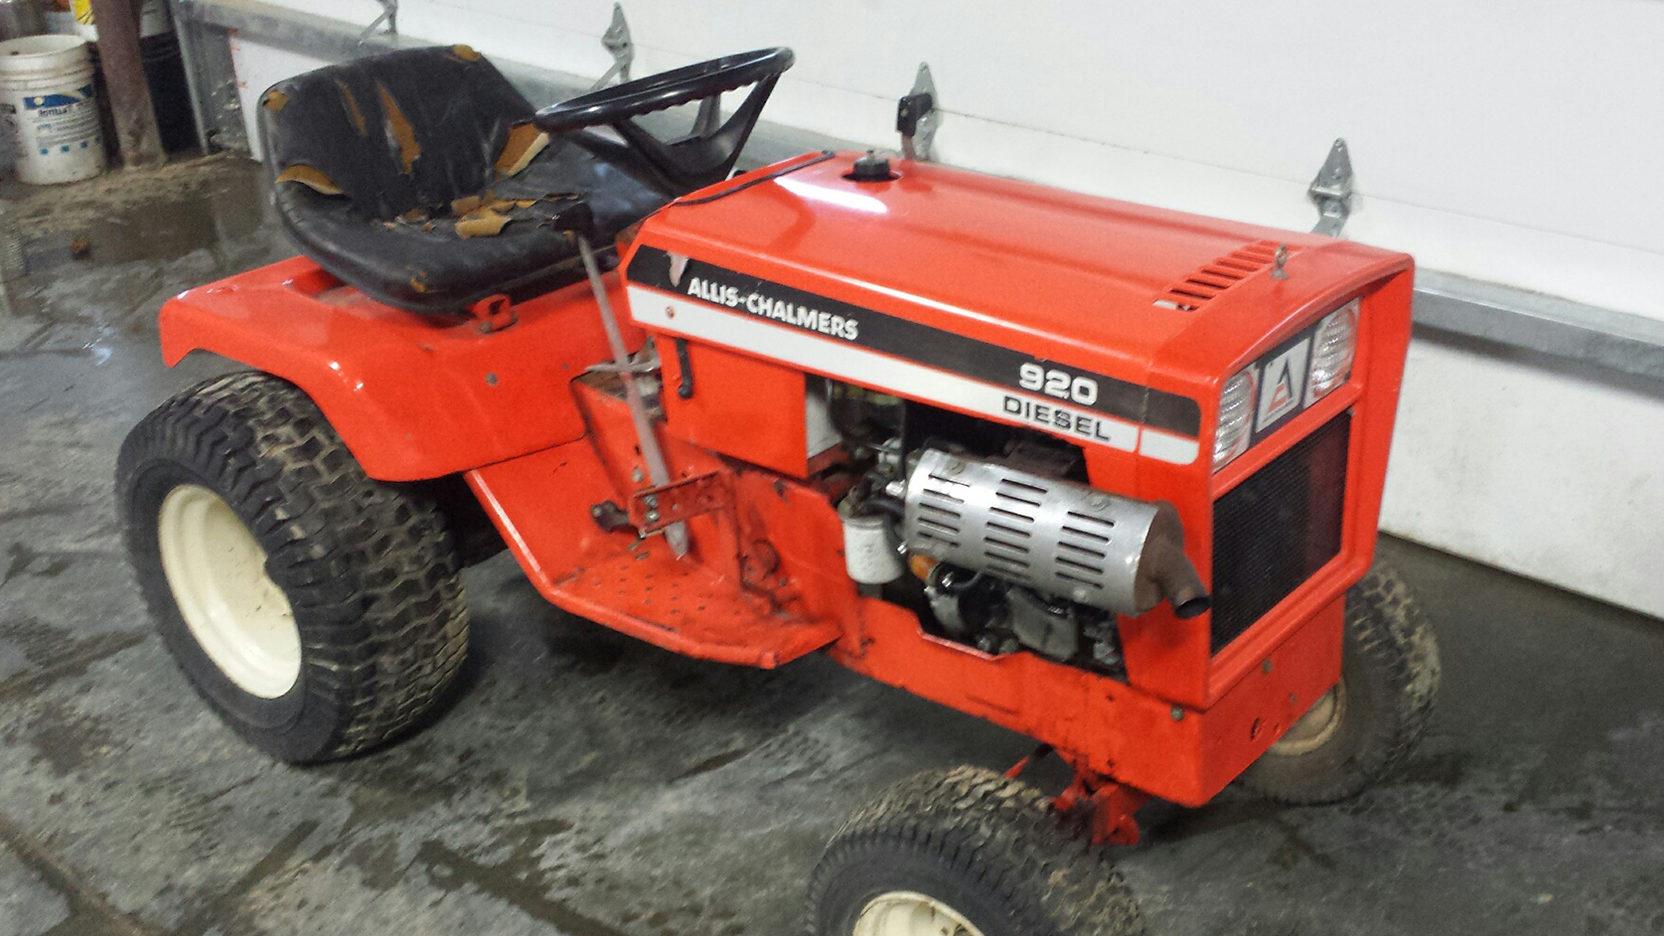 Allis Chalmers 920 Lawn Tractor   Allis Chalmers Lawn